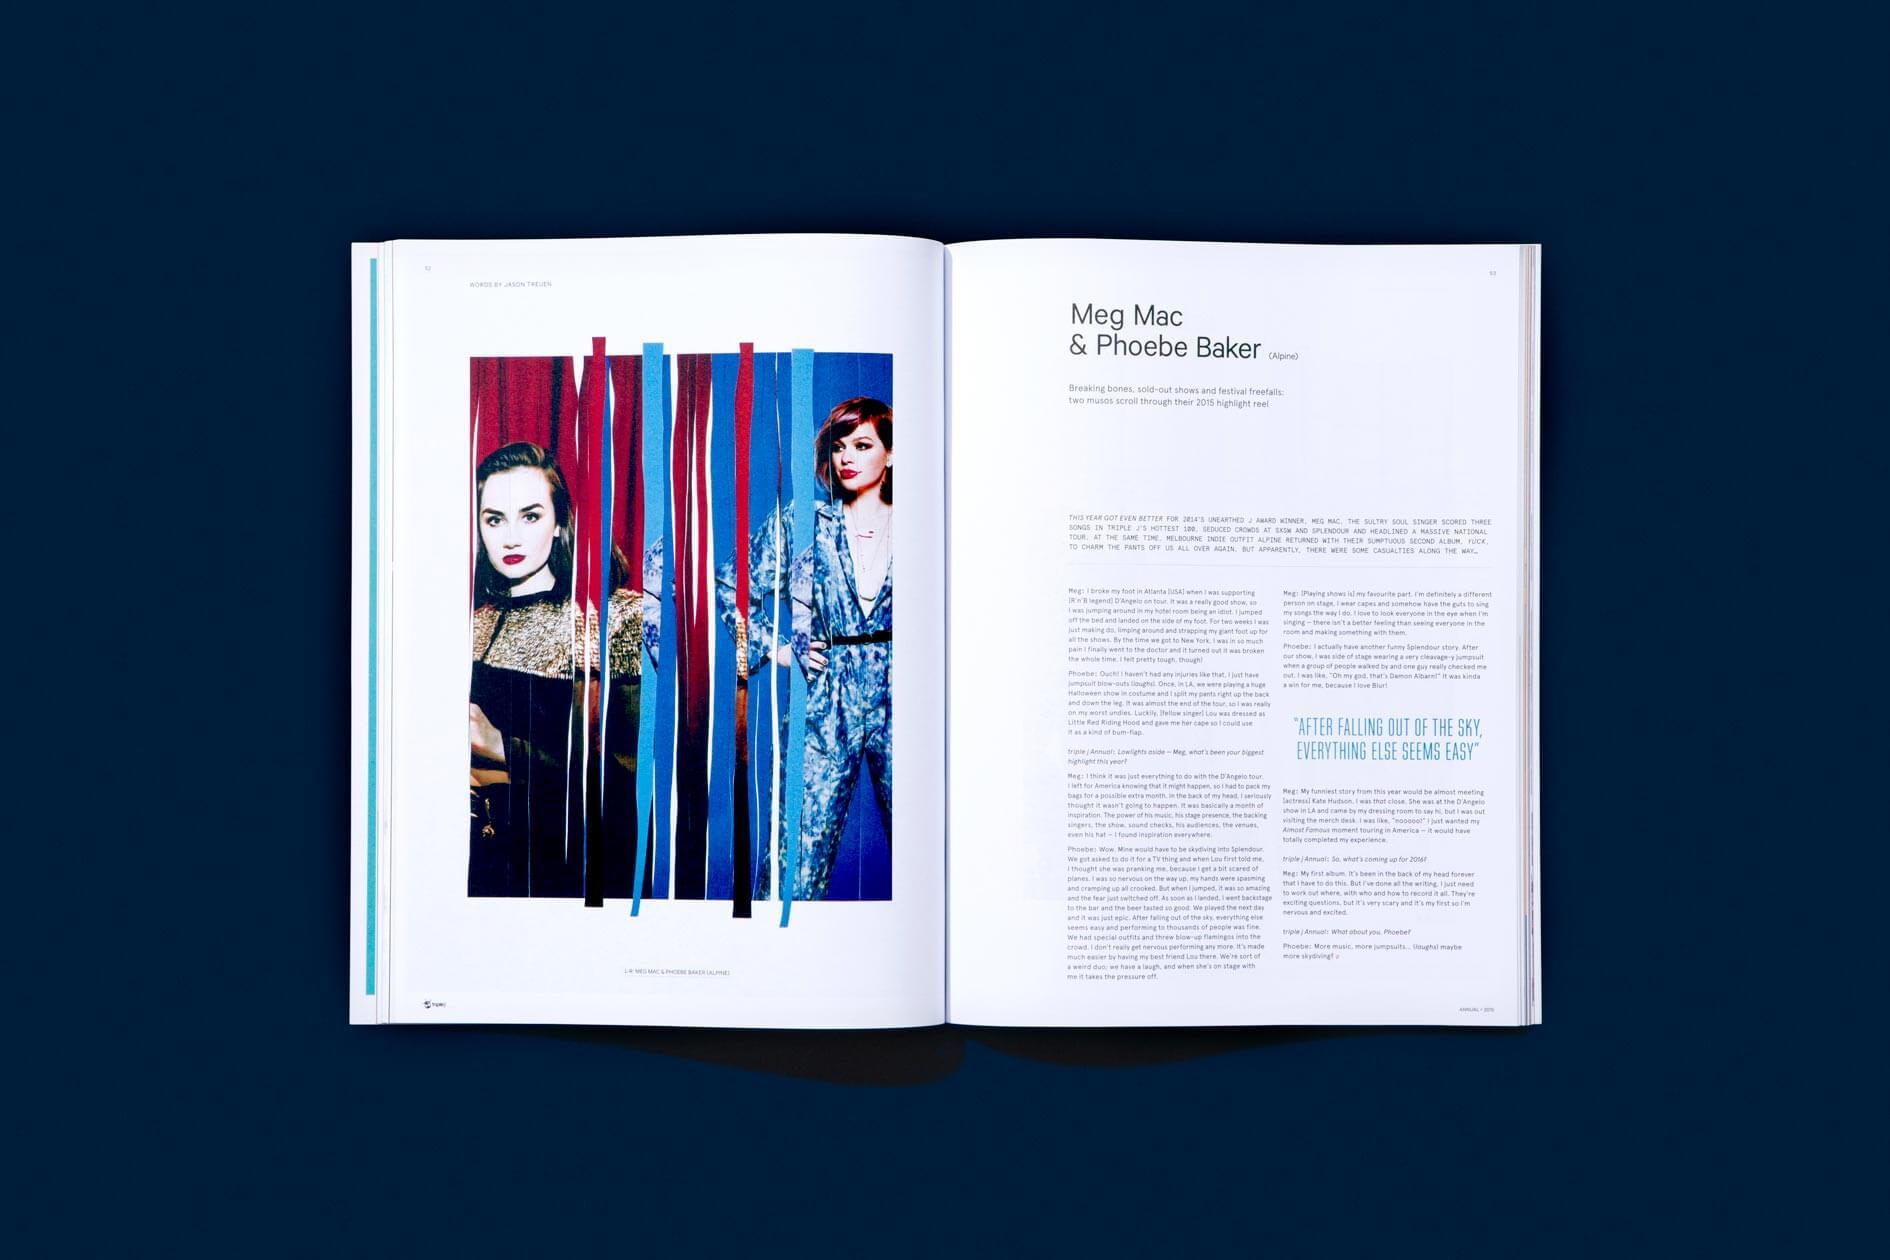 NatCarroll_triplej_Annual_2015_Magazine_MegMac_PhoebeBaker_Spread_10col